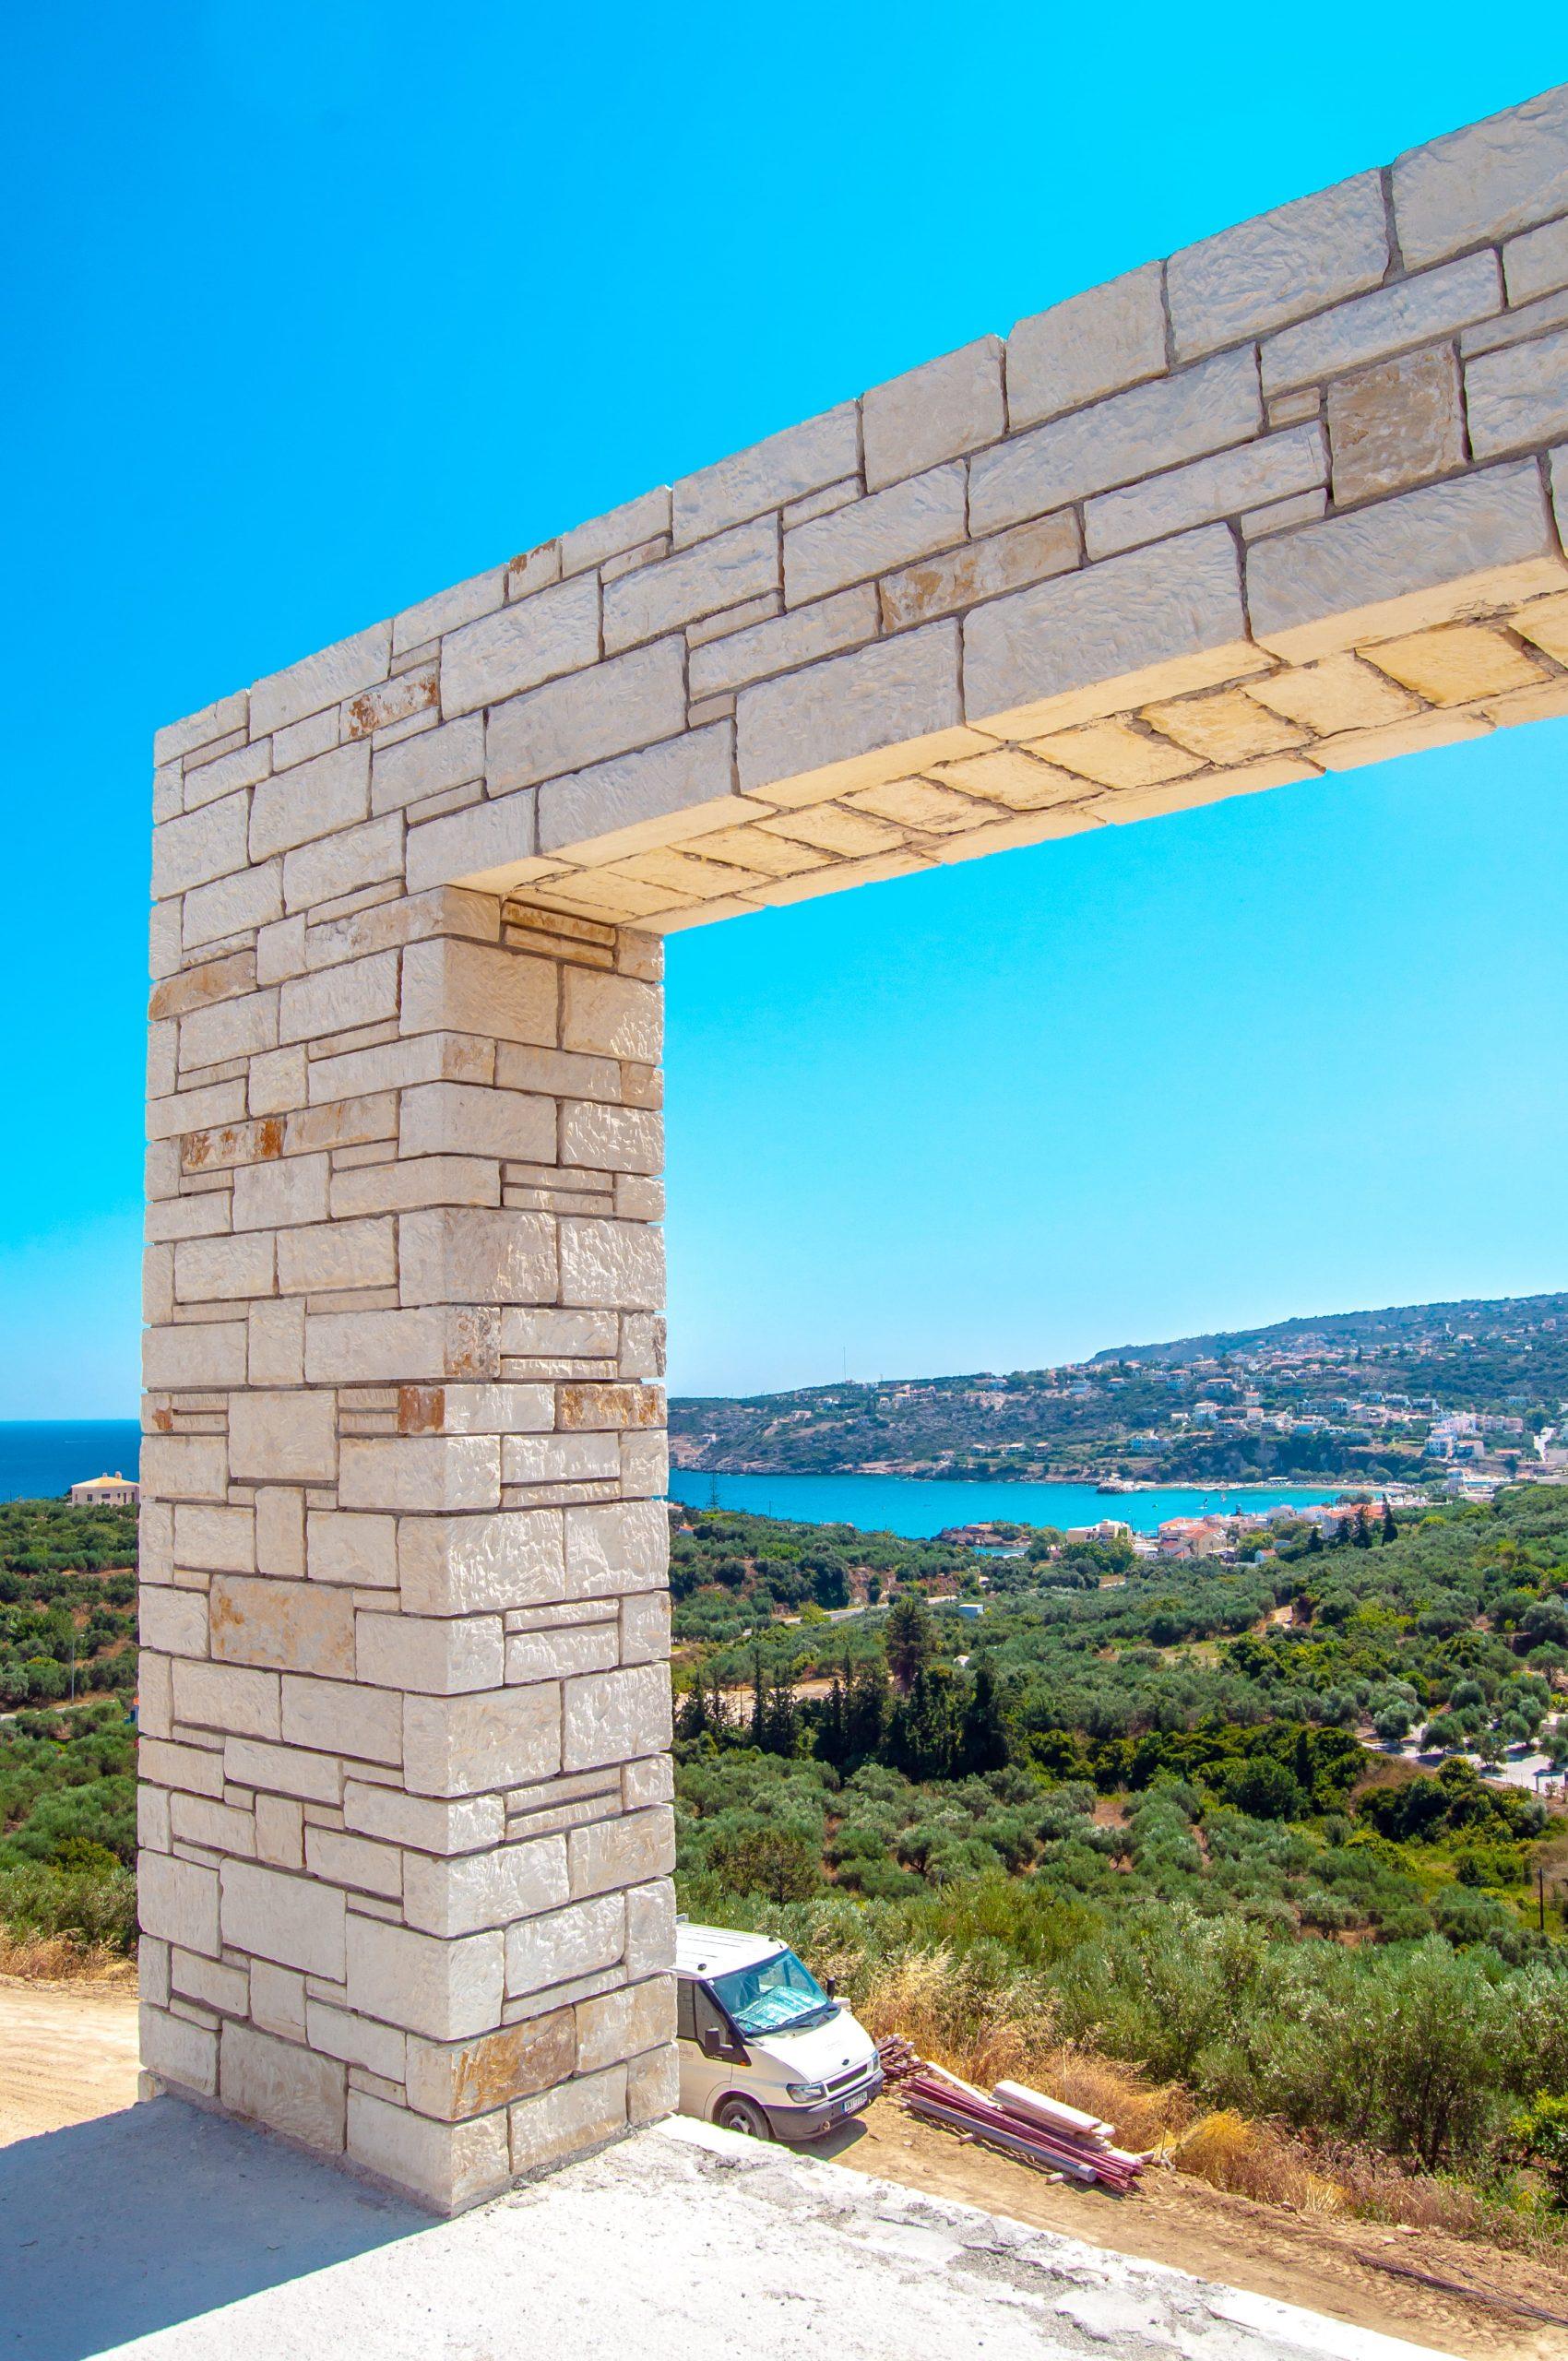 Luxury Stone Houses in Crete Chania- Houses for sale in Apokoronas